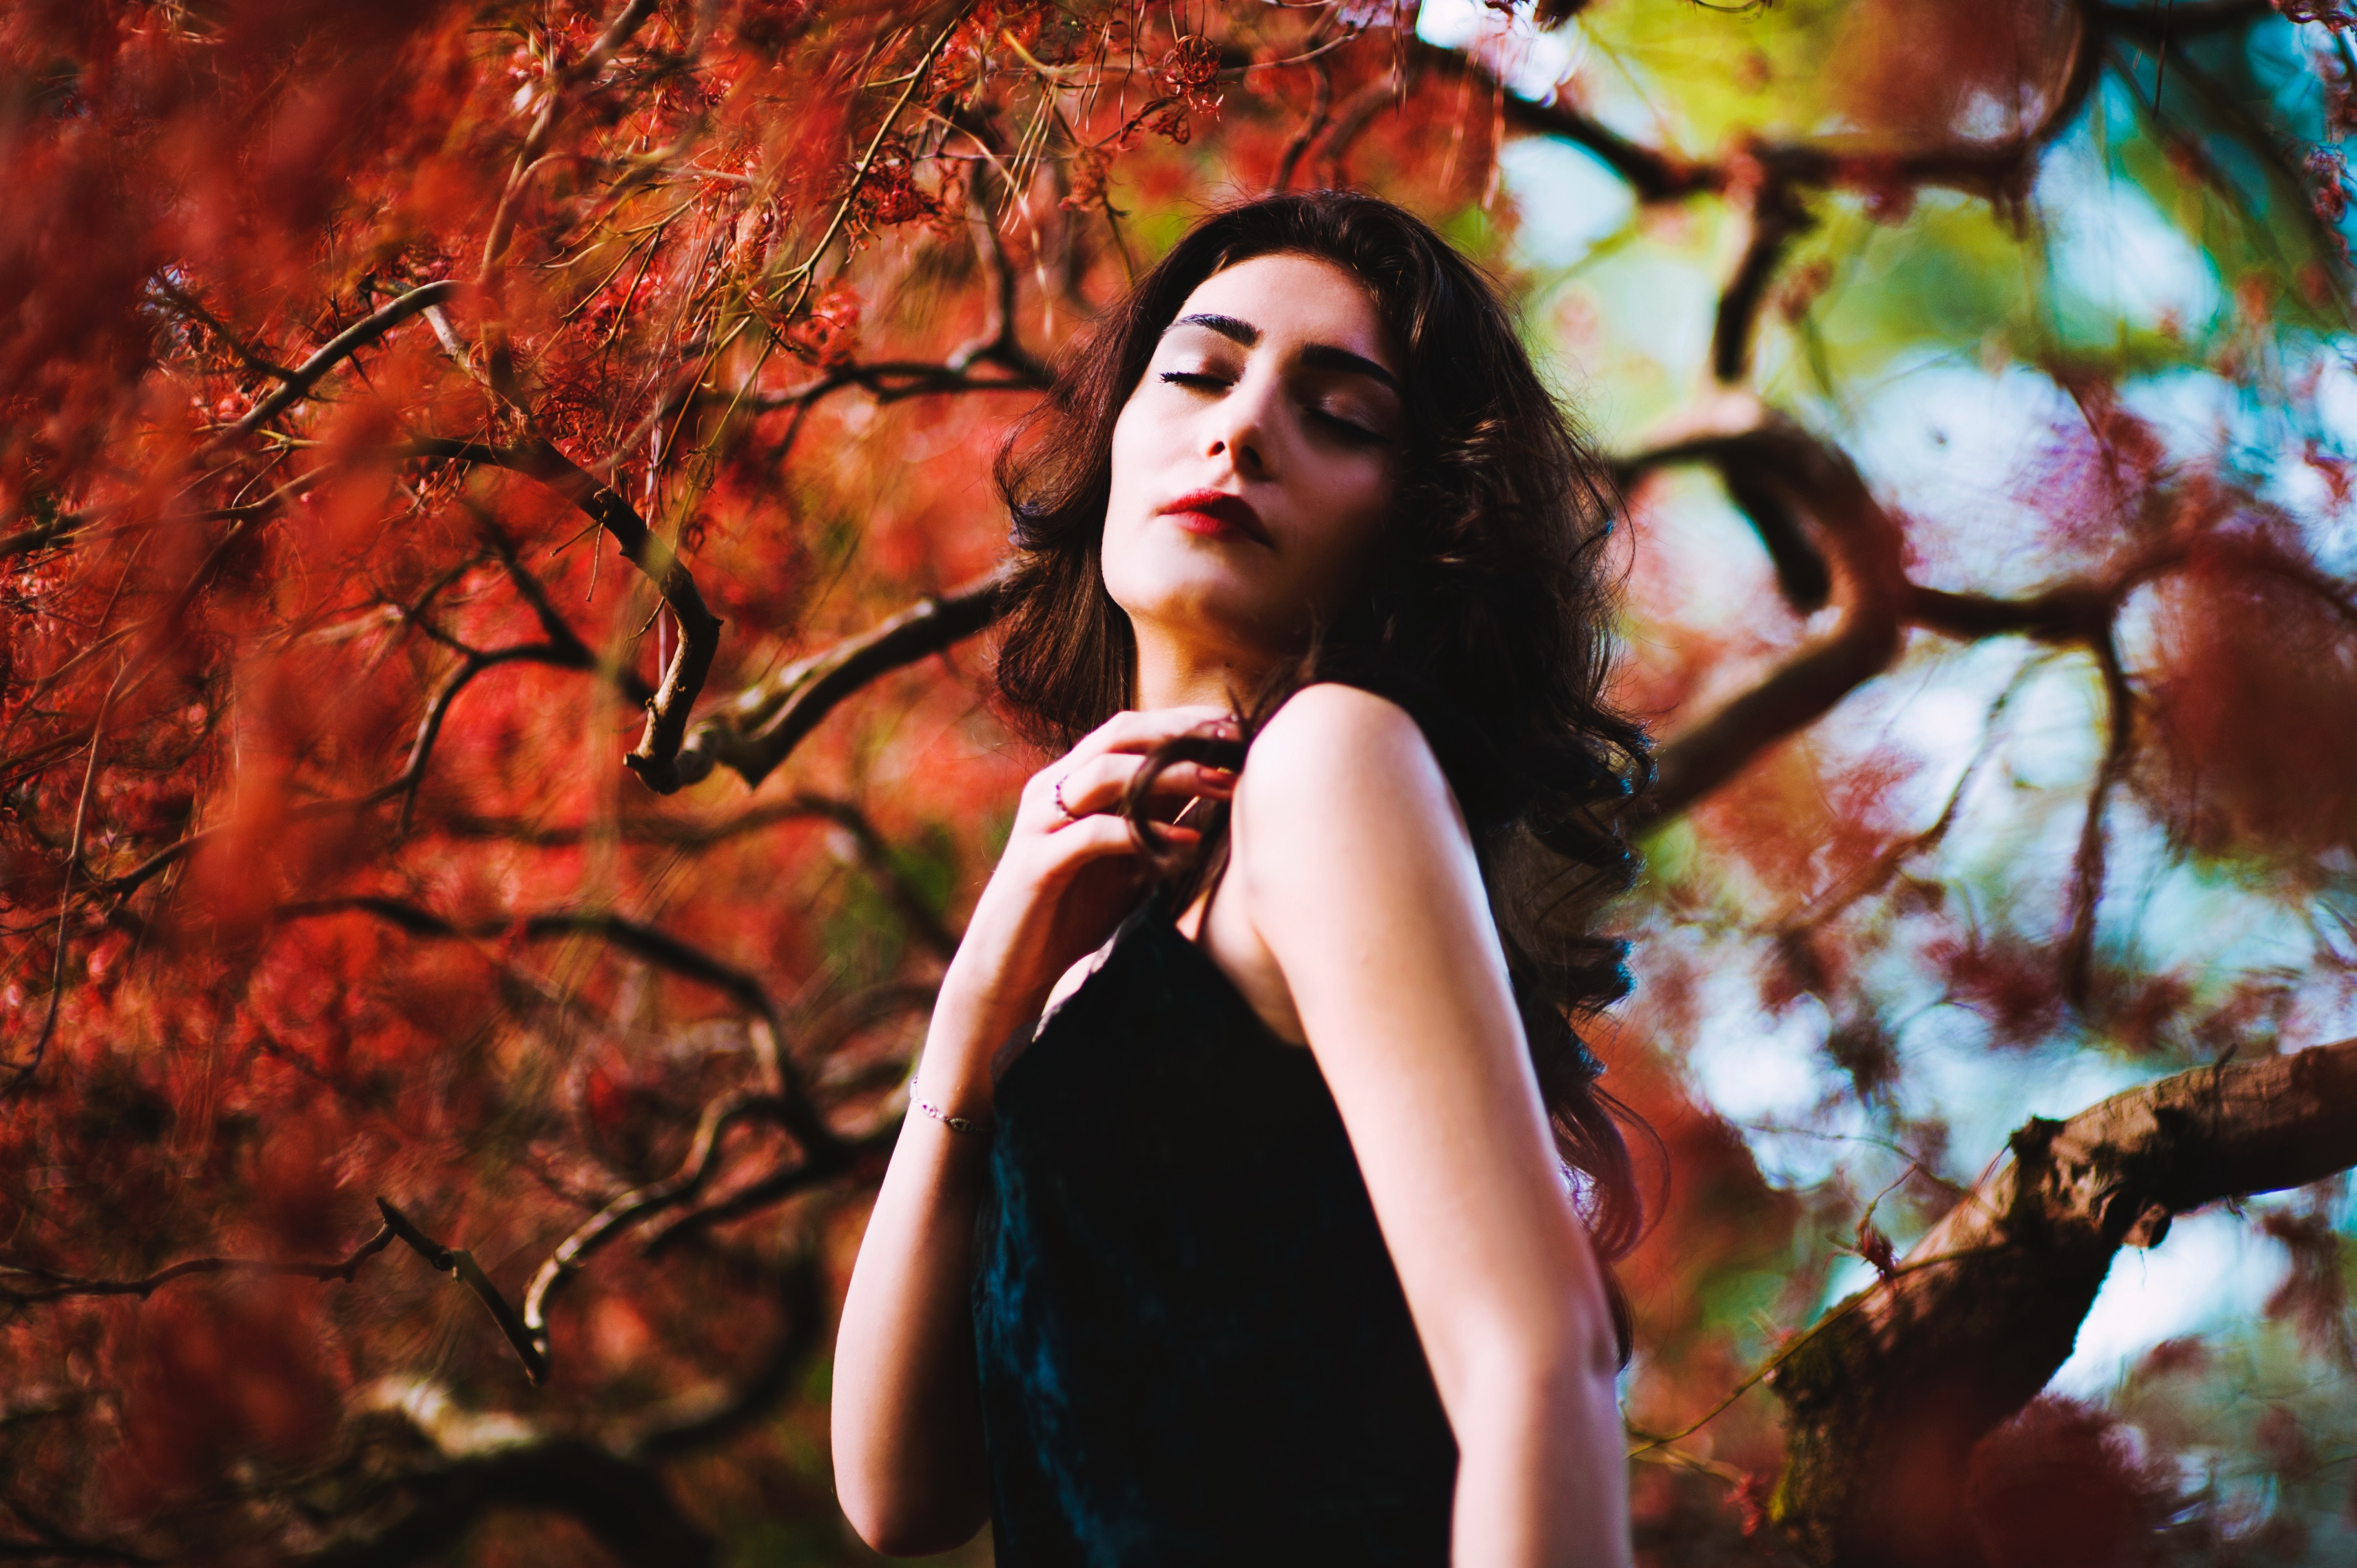 Woman in Autumnal scene